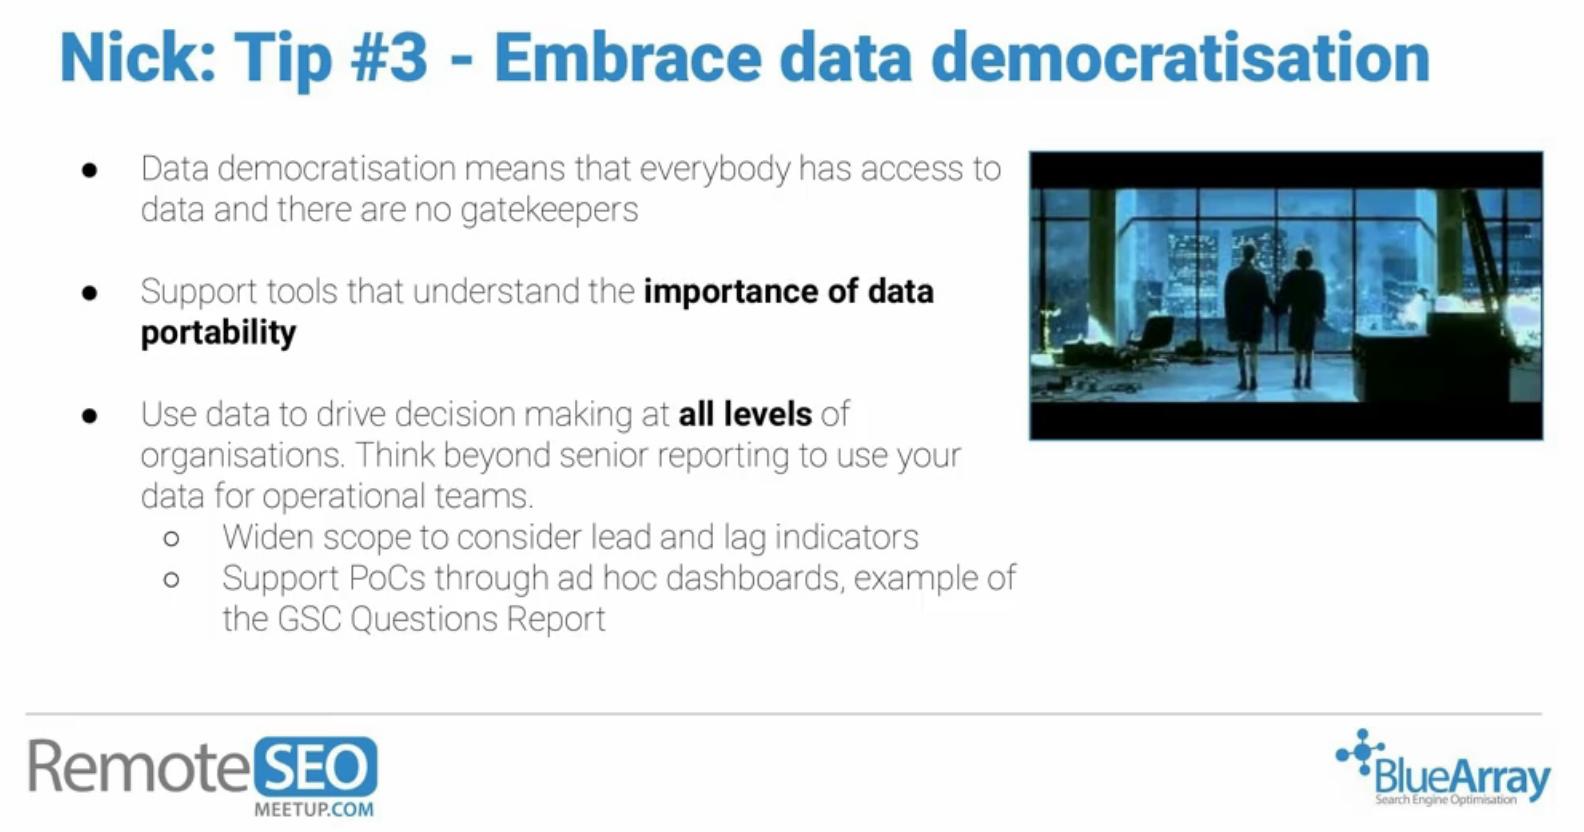 Embrace data democratisation RemoteSEO tip